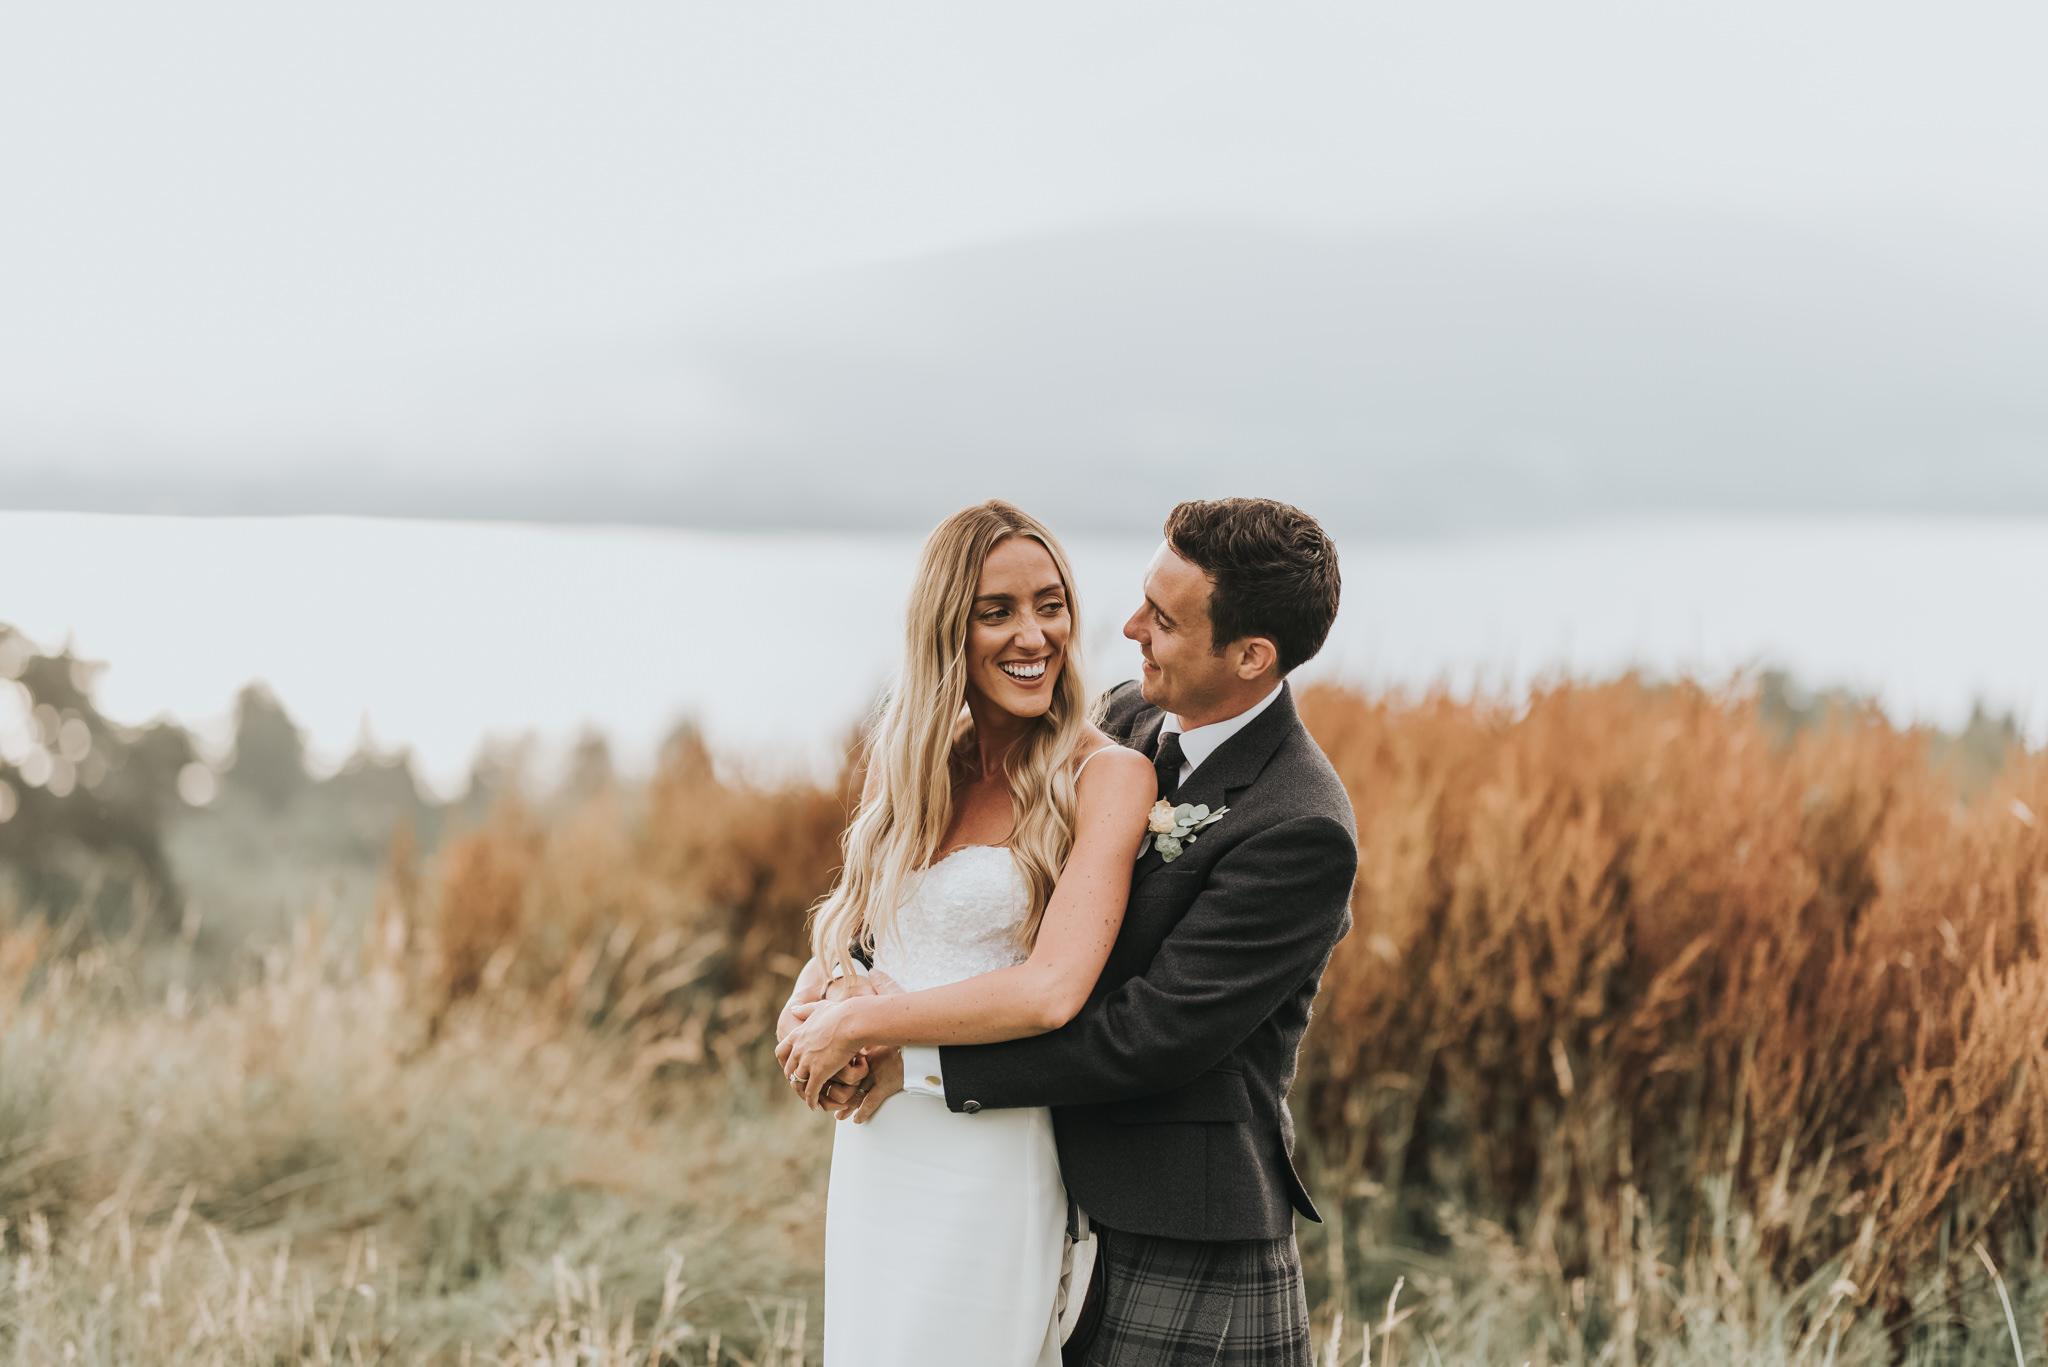 Boturich Castle wedding photos, wedding Boturich Castle, wedding photographer Edinburgh, wedding photographer Scotland, wedding photographer Glasgow, Karol Makula Photography, wedding photography Scotland, Scotland wedding photographer